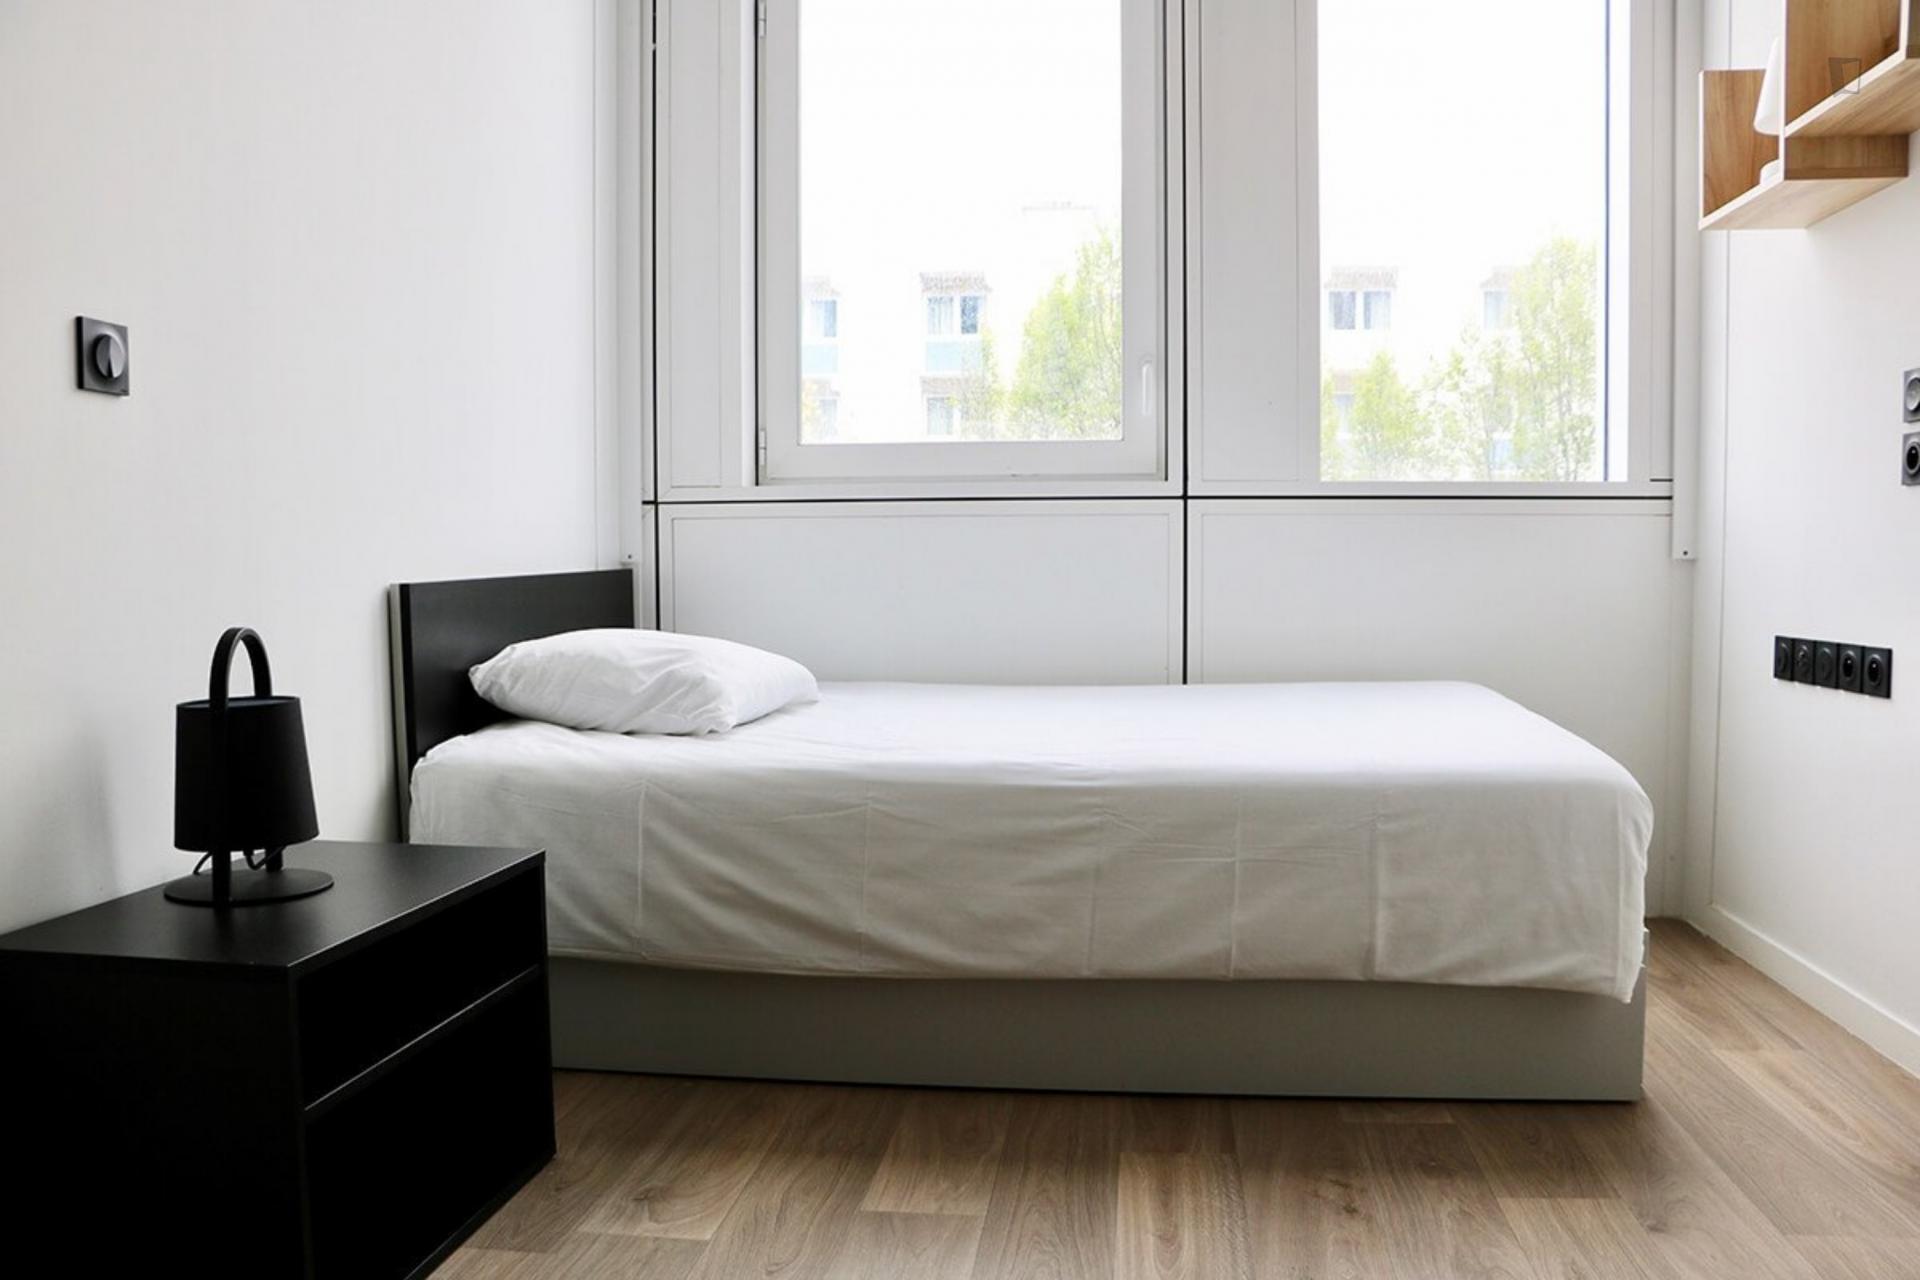 Bedroom in student residence duplex in Paris